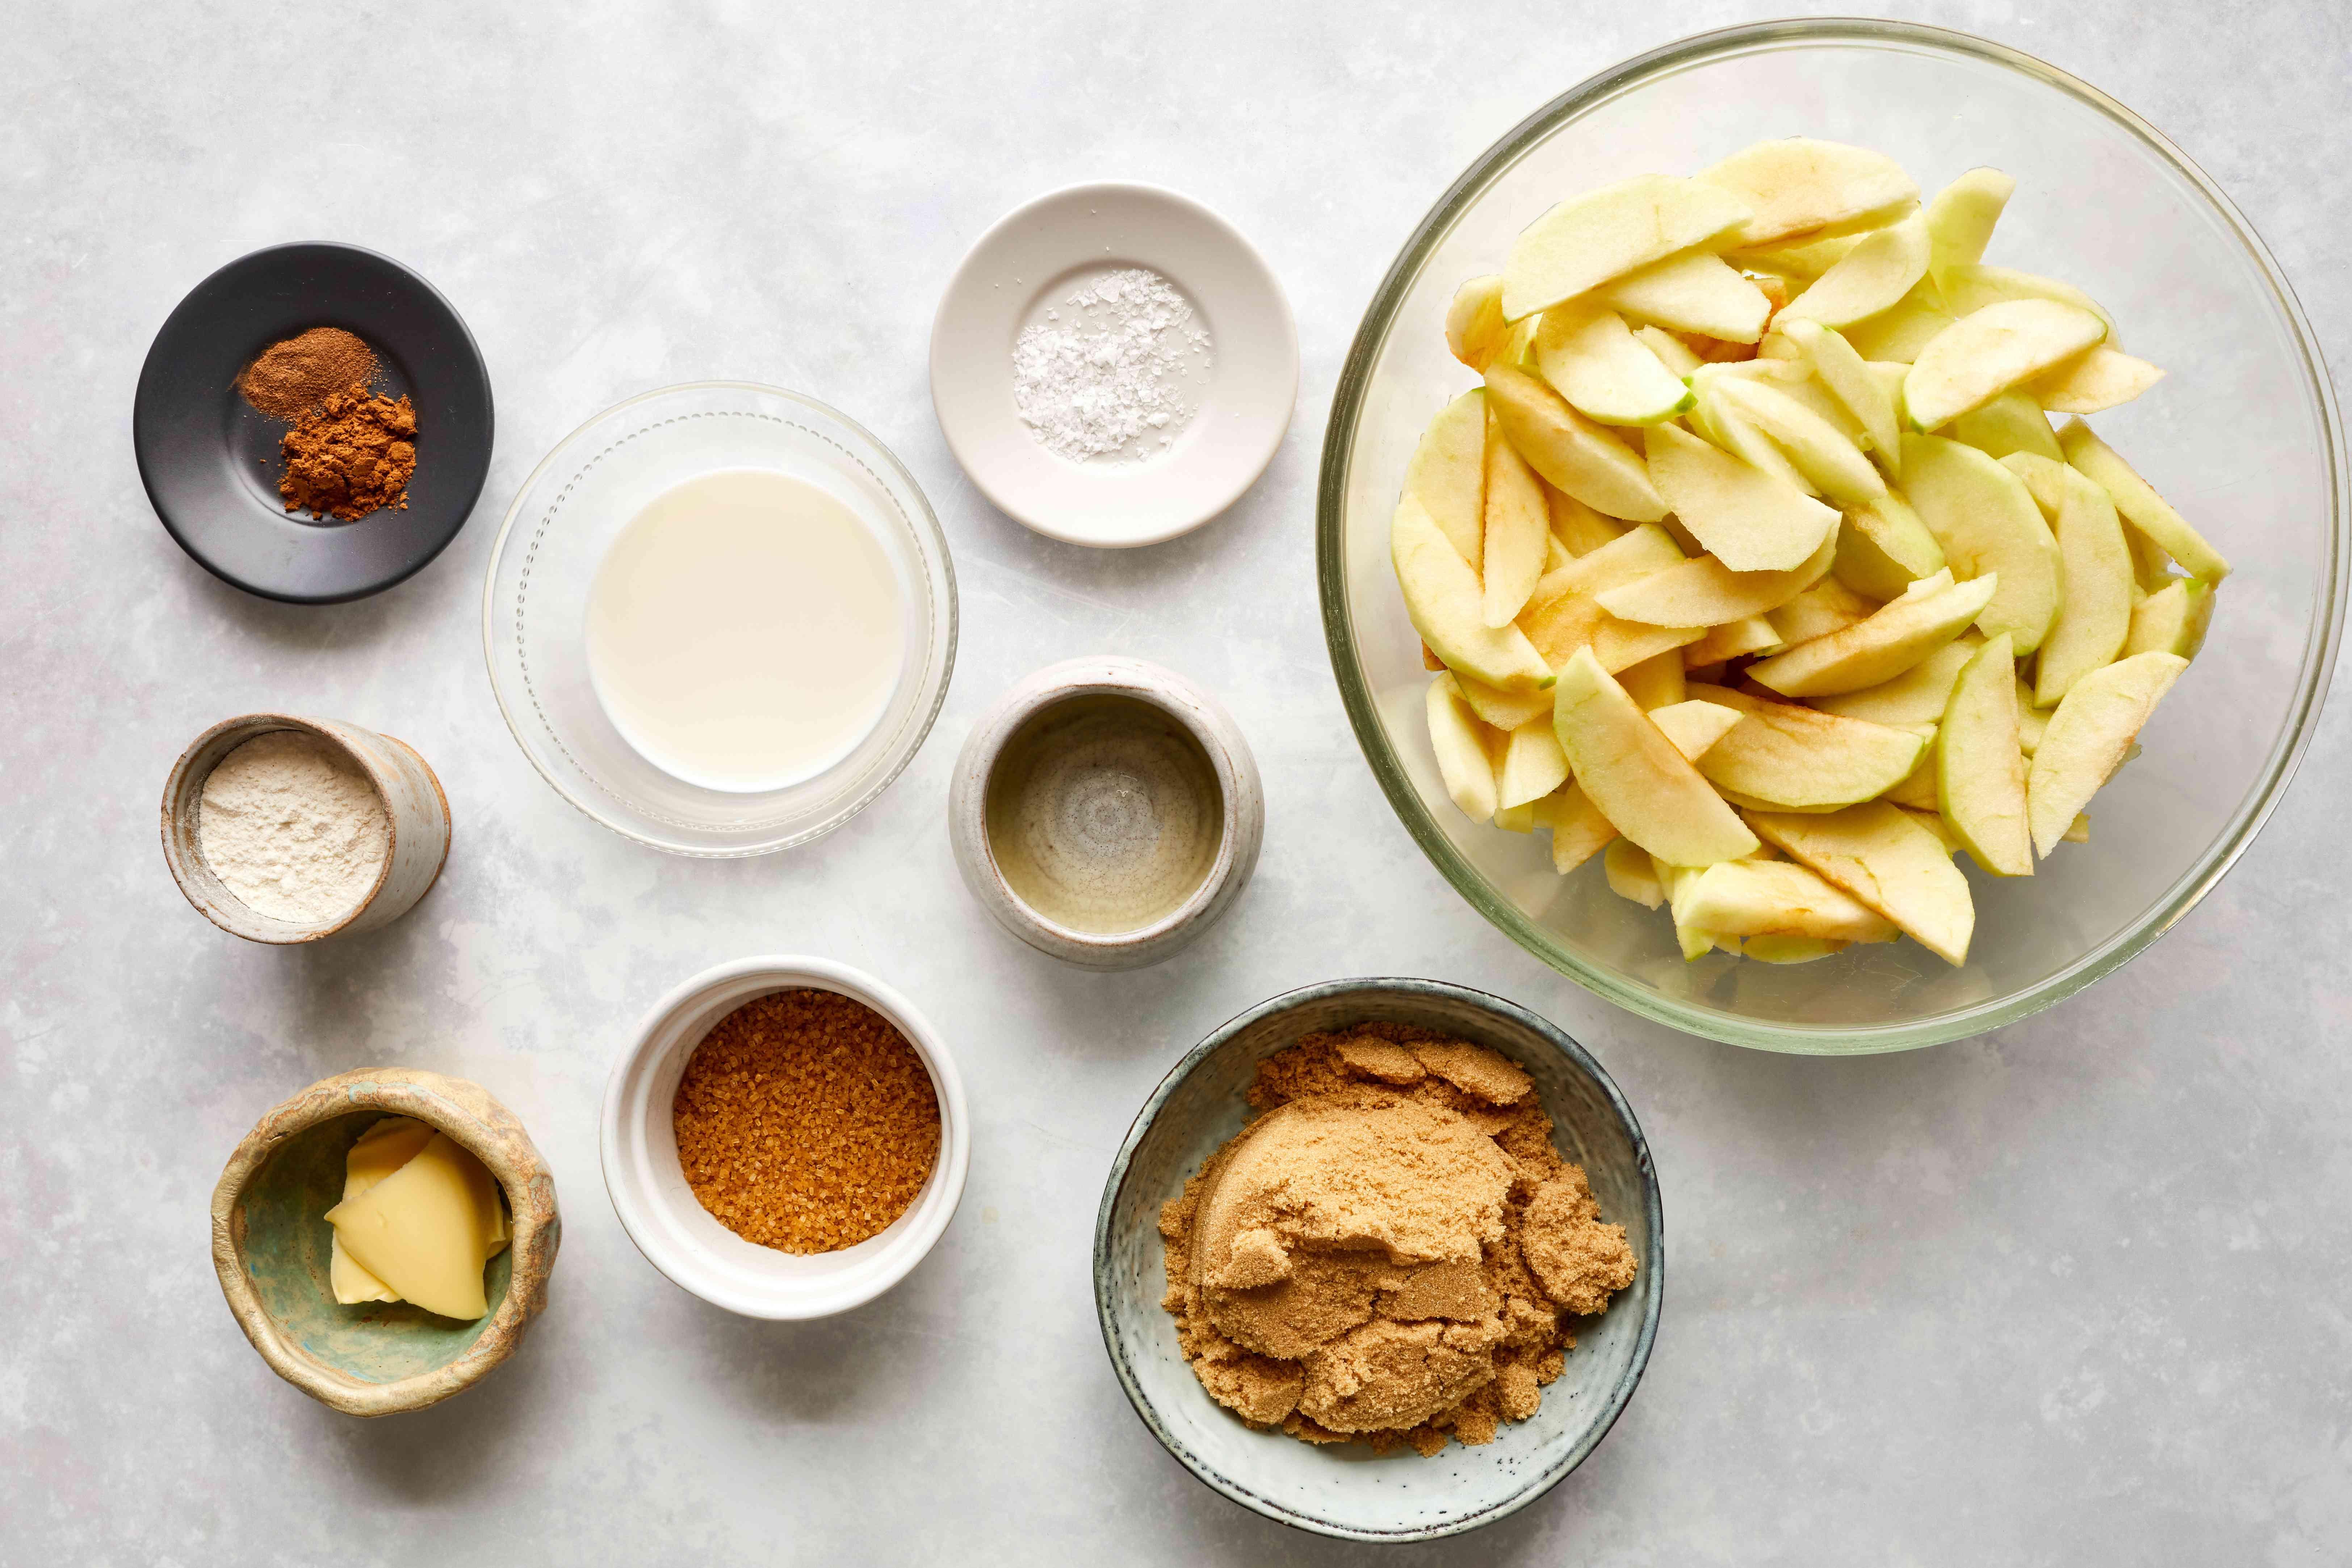 Granny Smith Apple Pie filling ingredients, apple slices, sugar, salt, butter, milk, flour, lemon juice, nutmeg, cinnamon,